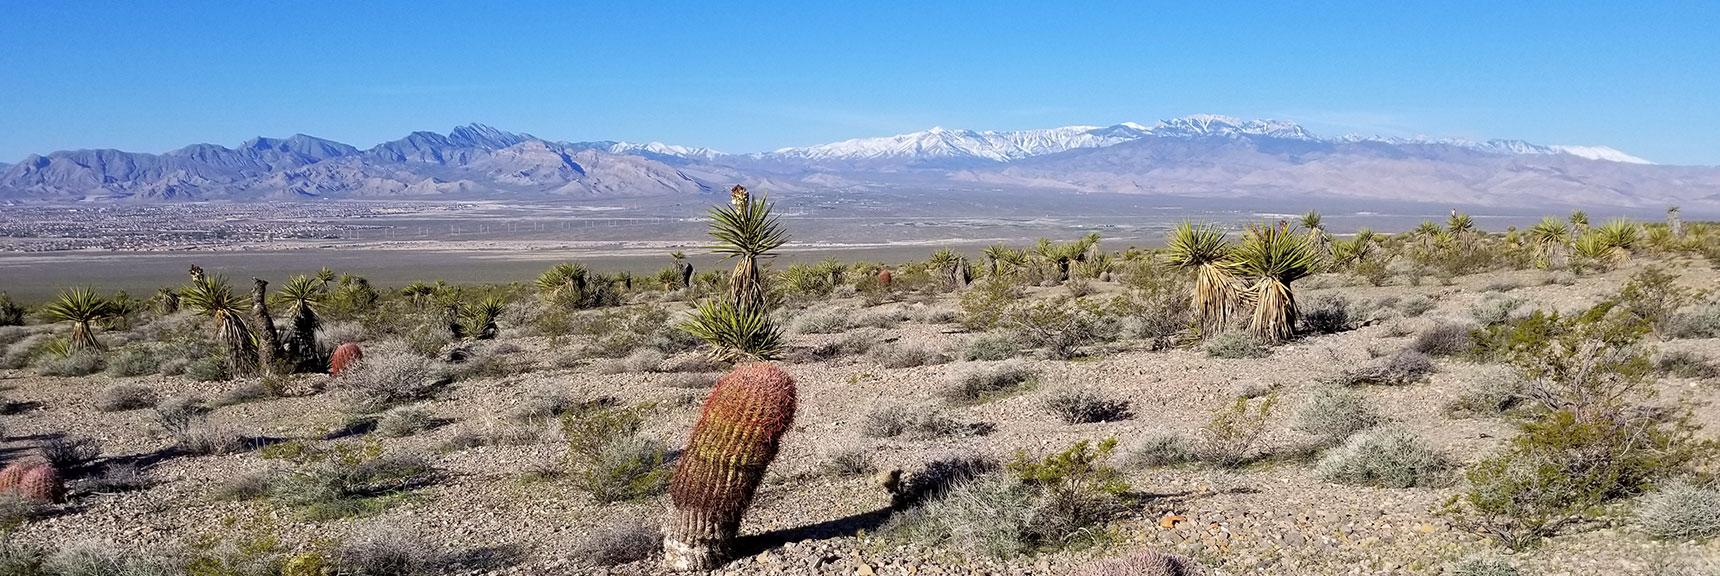 Assortment of Desert Plants South of Gass Peak, Nevada